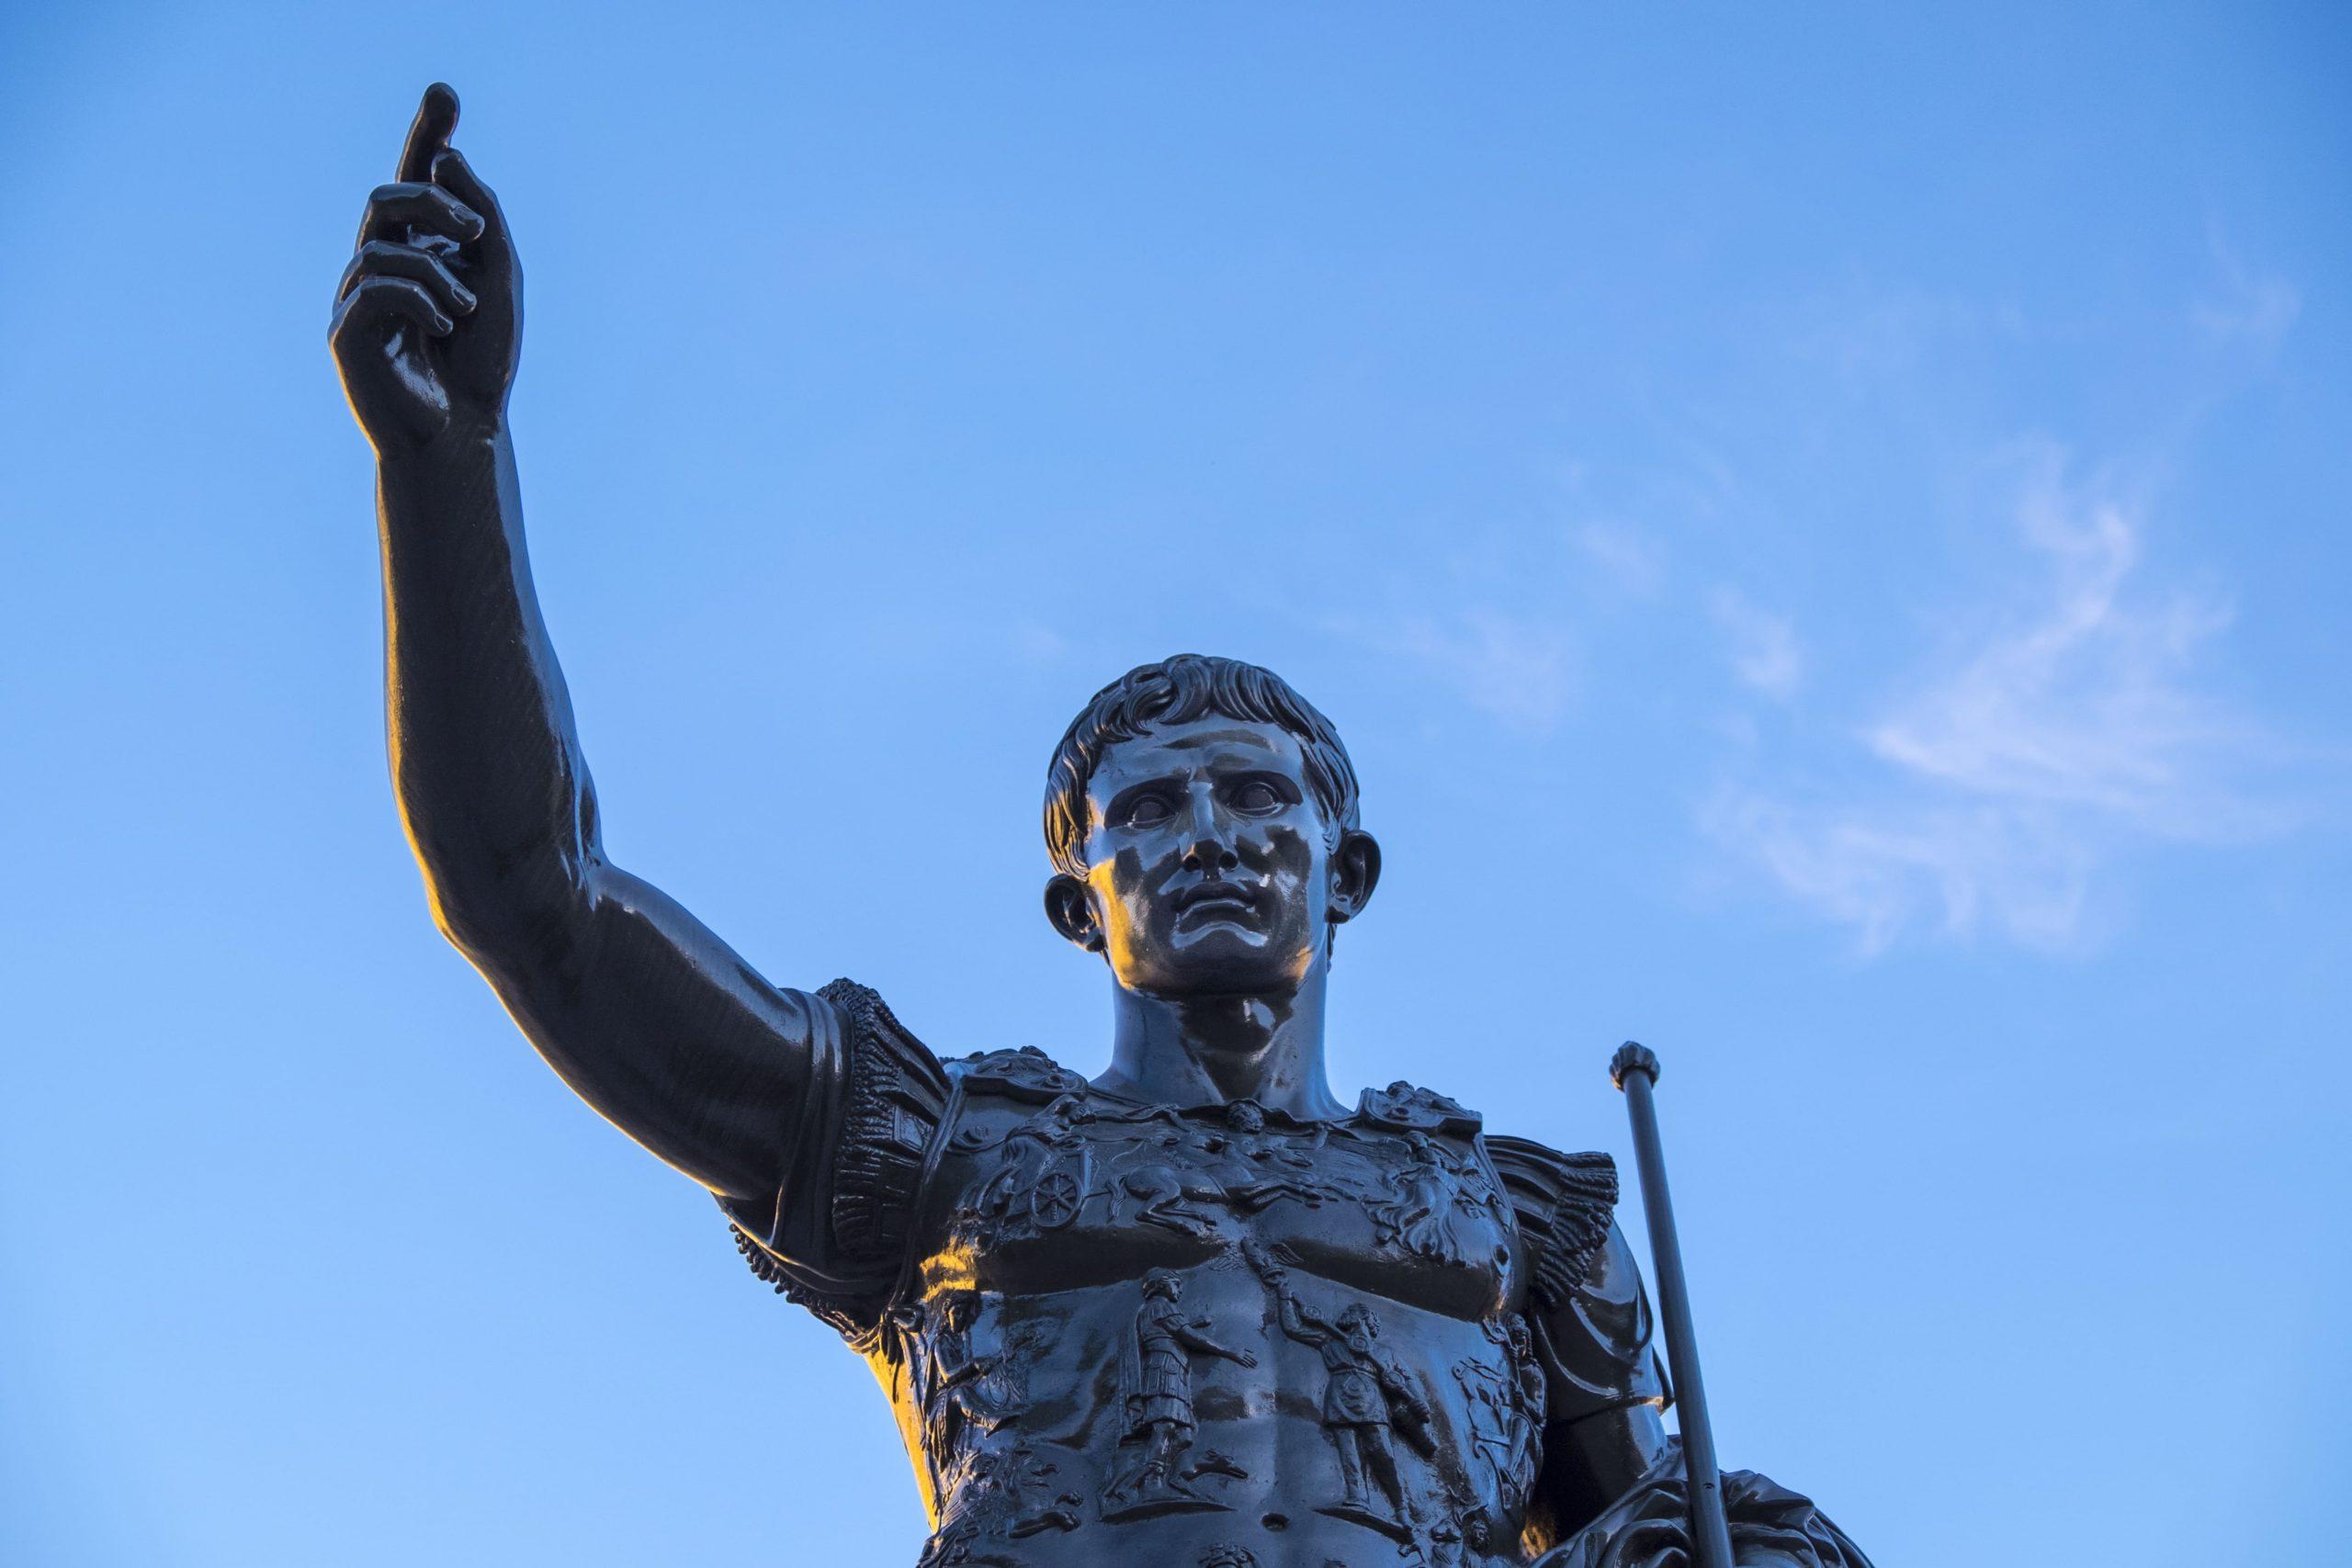 ¡Ave César! Ruta por la Zaragoza romana